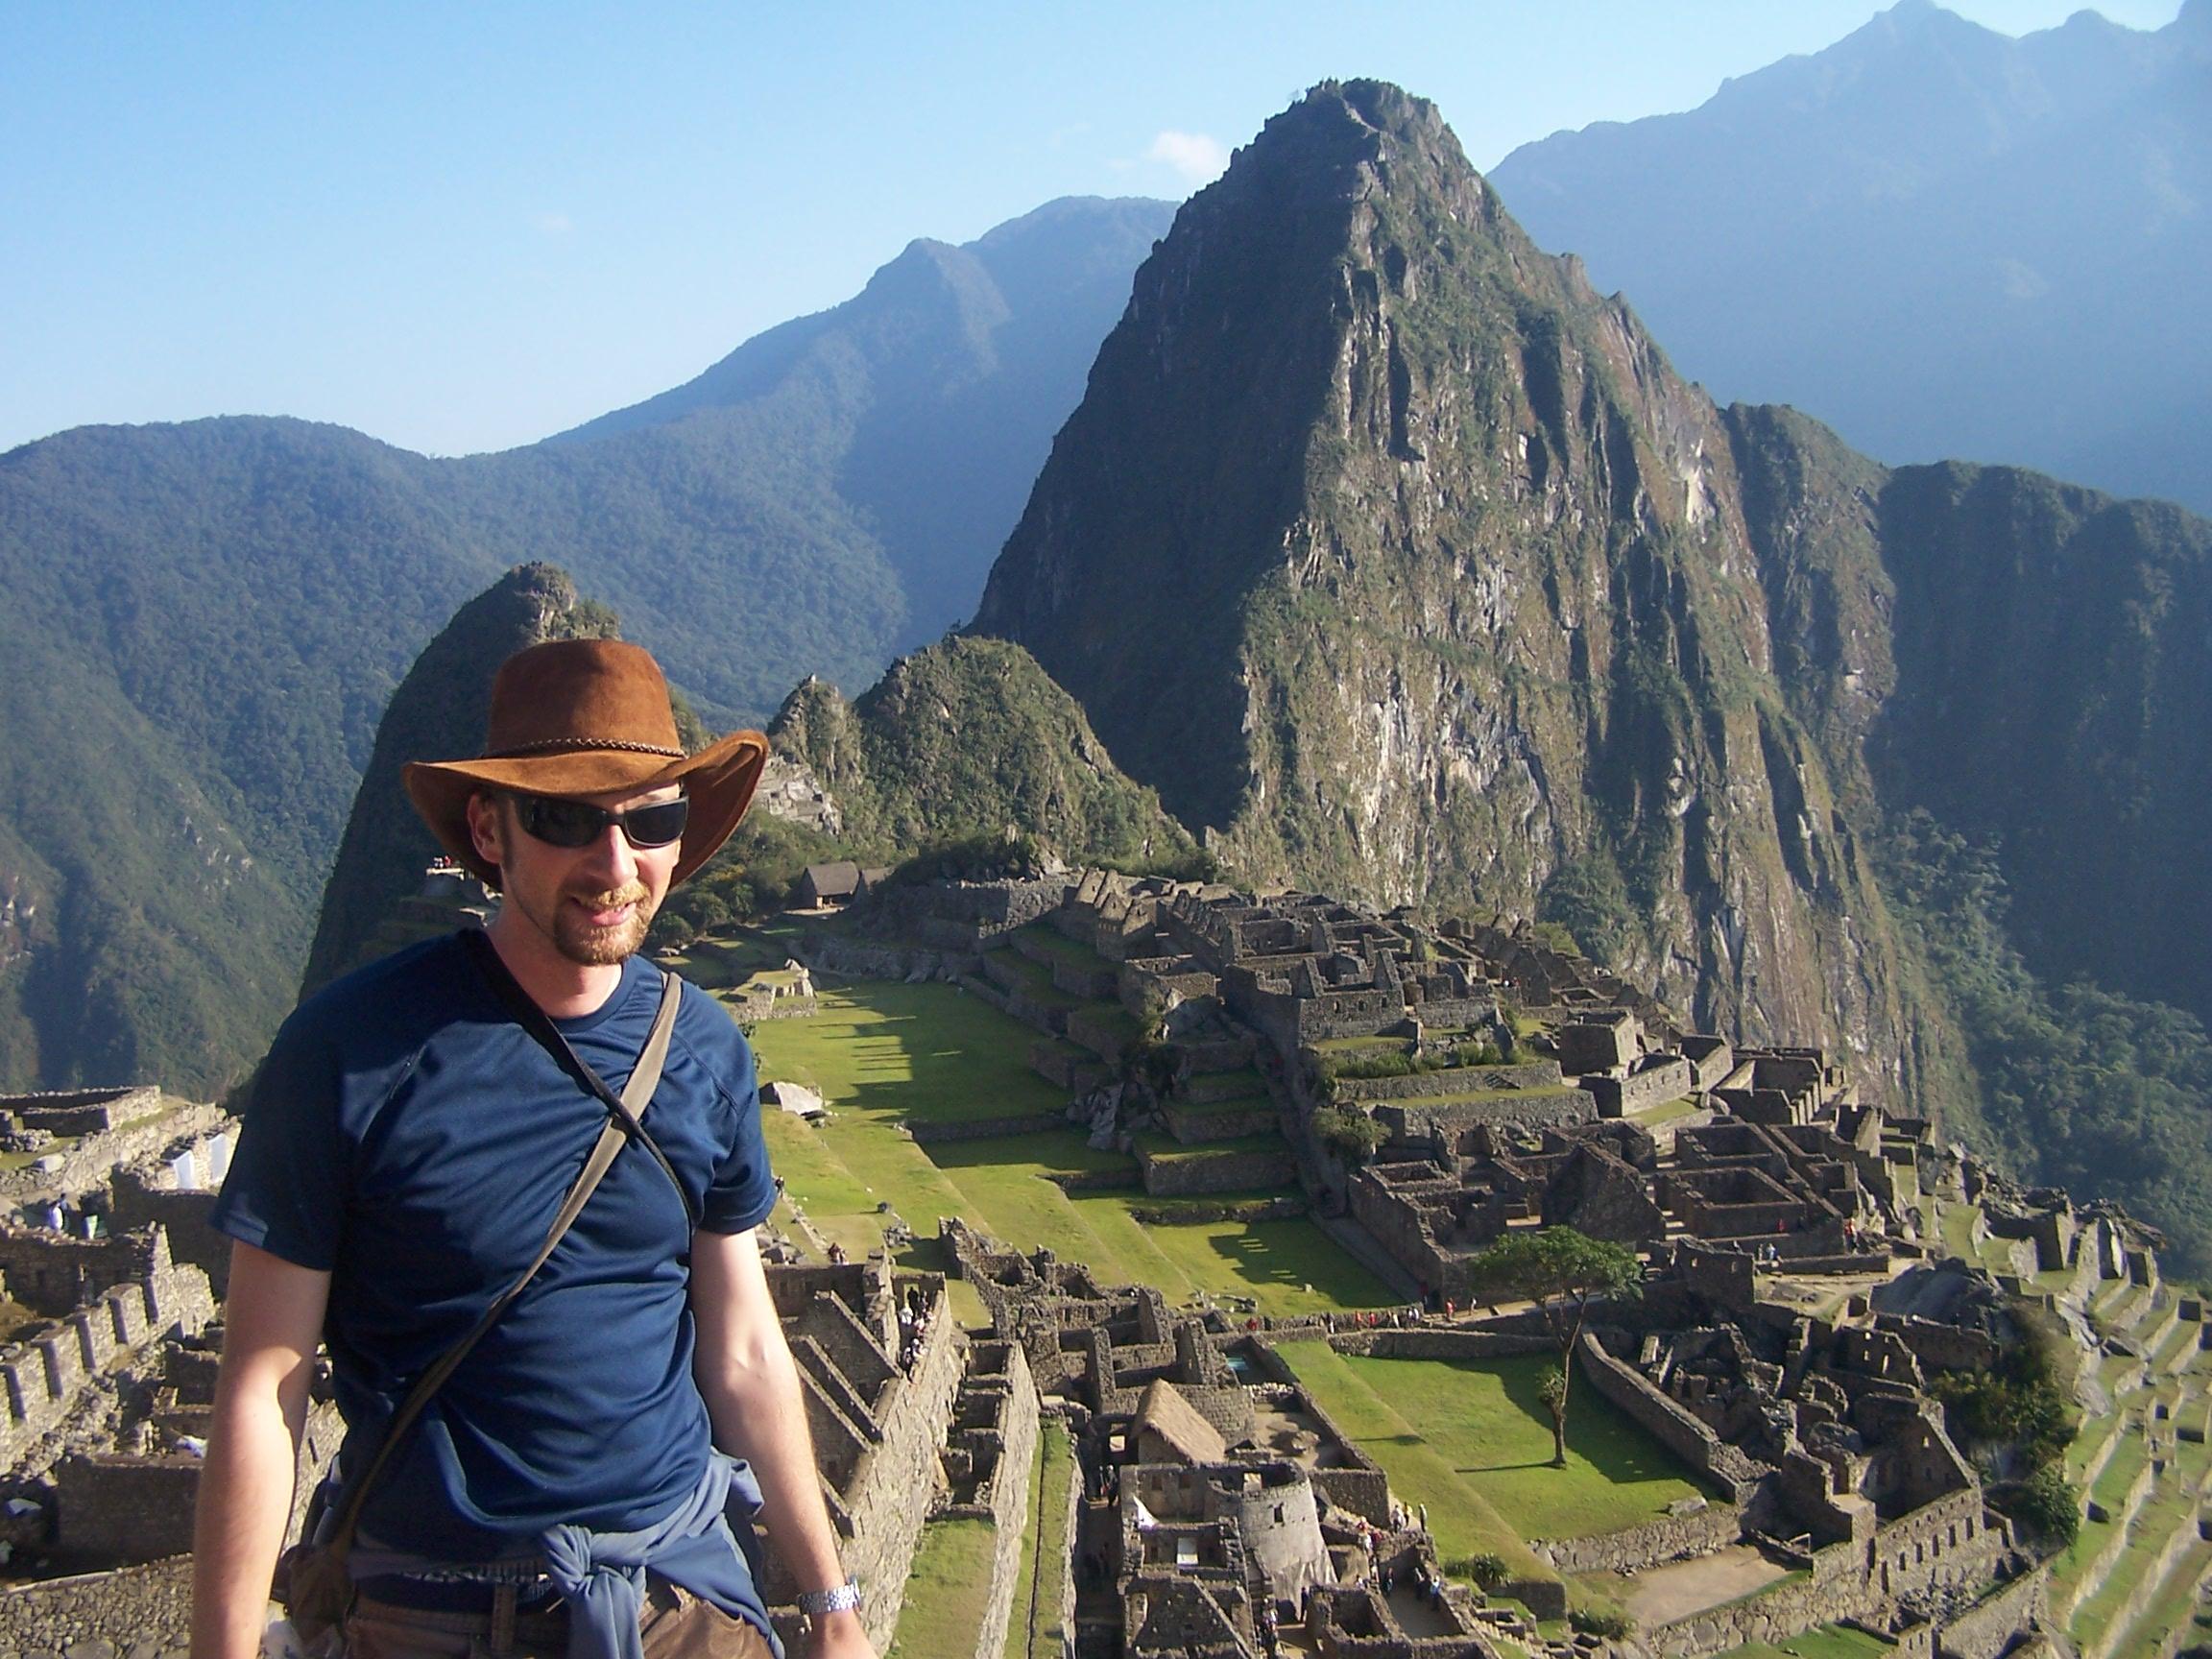 Finishing the Inca trail at Machu picchu